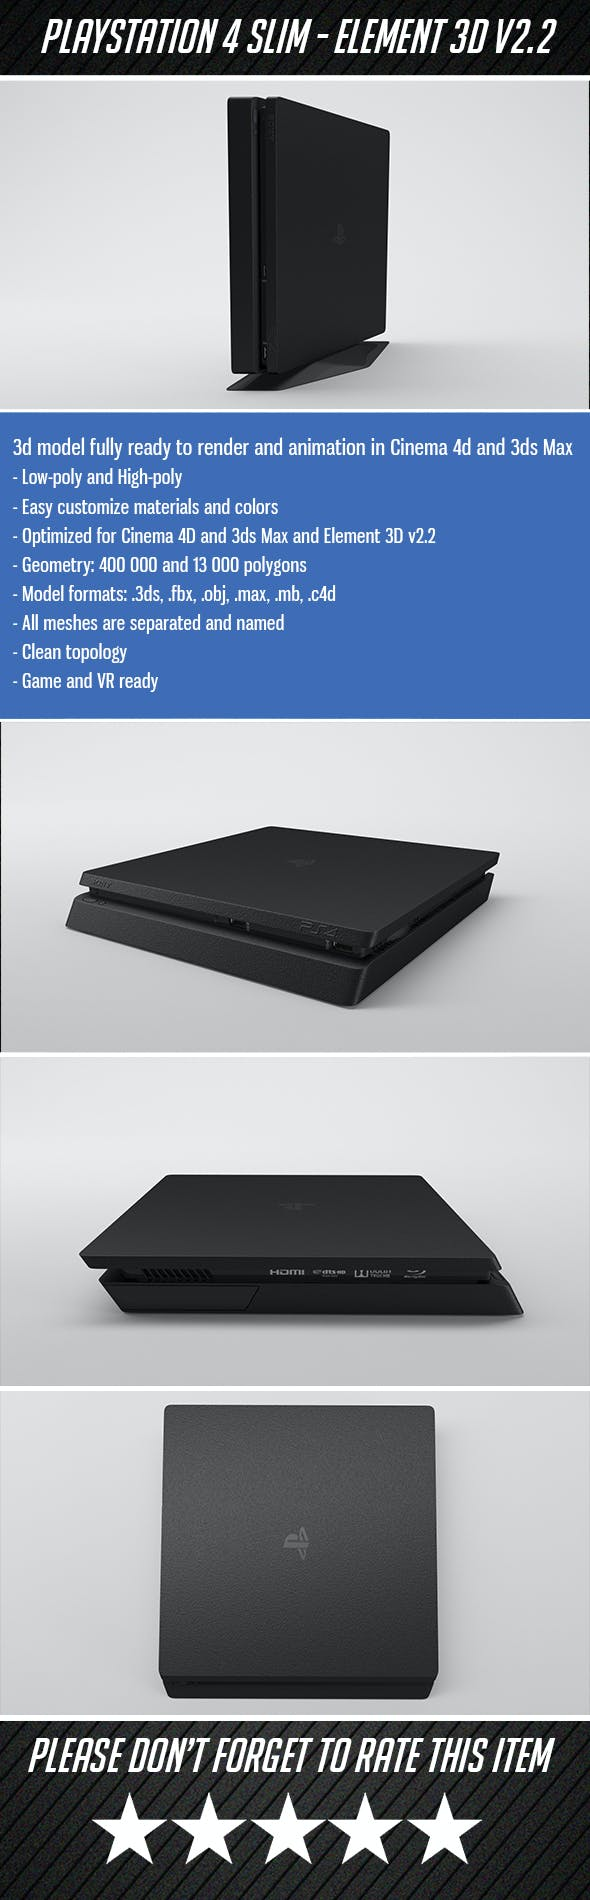 Sony Playstation 4 Slim - Element 3D - 3DOcean Item for Sale